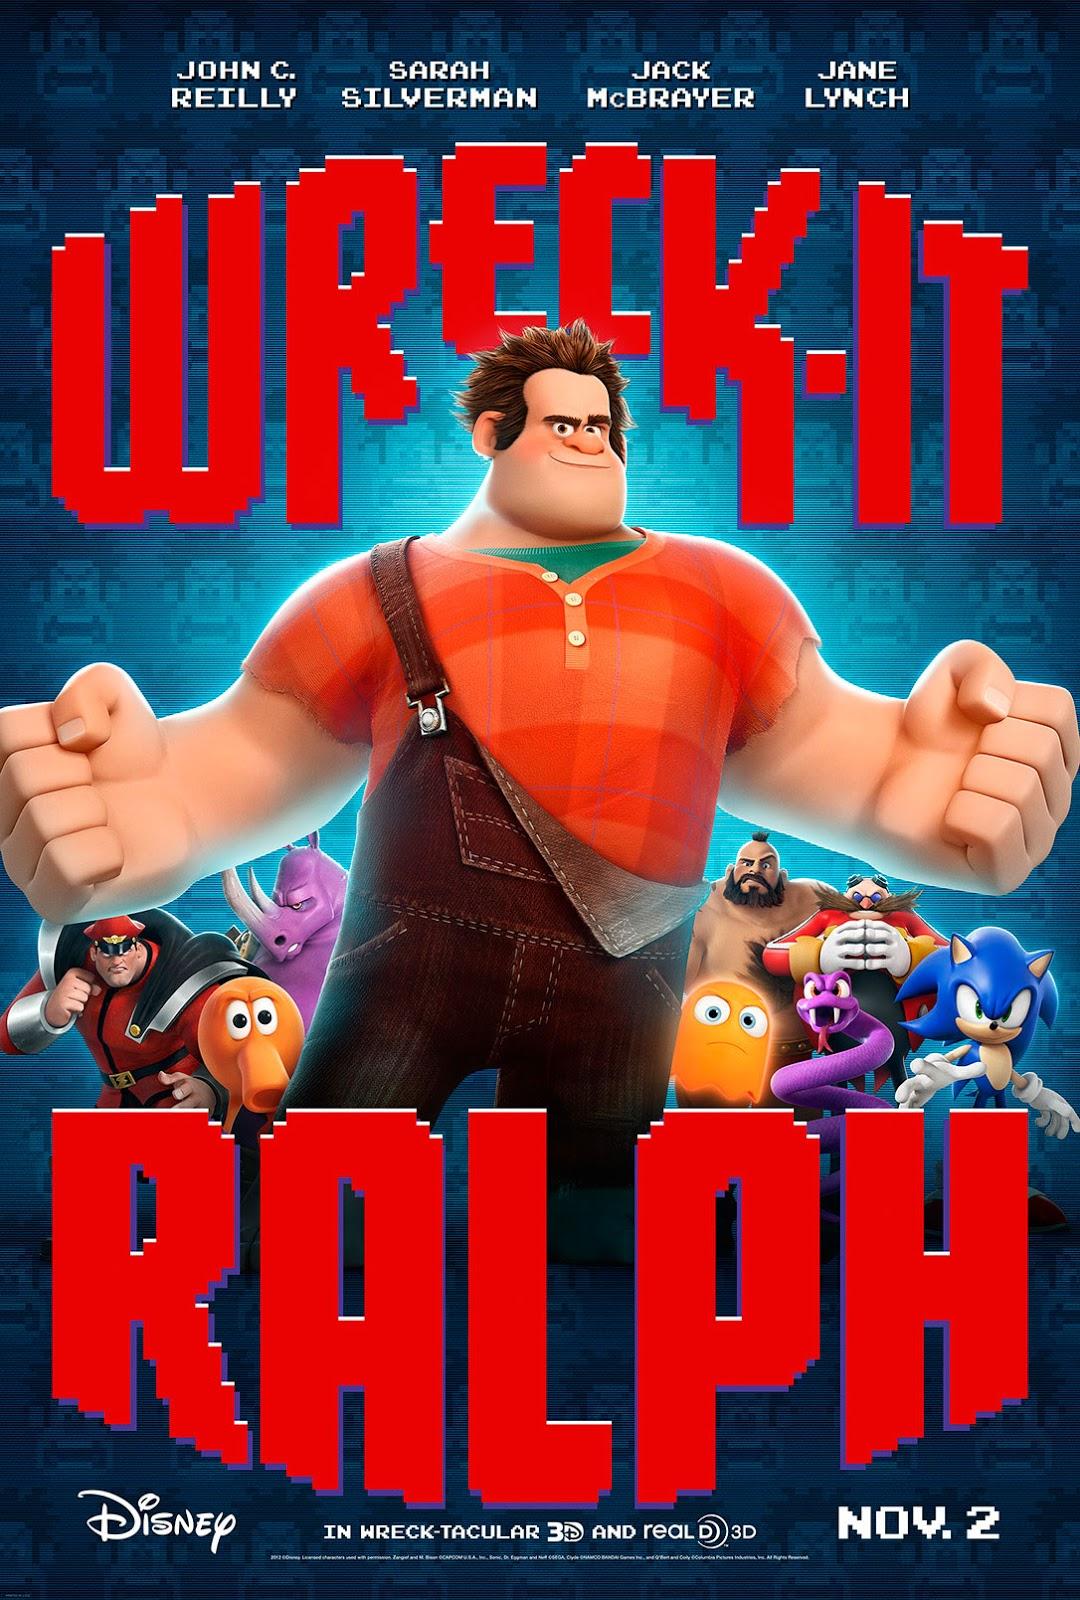 Wreck-It-Ralph sequel? | Euro Palace Casino Blog